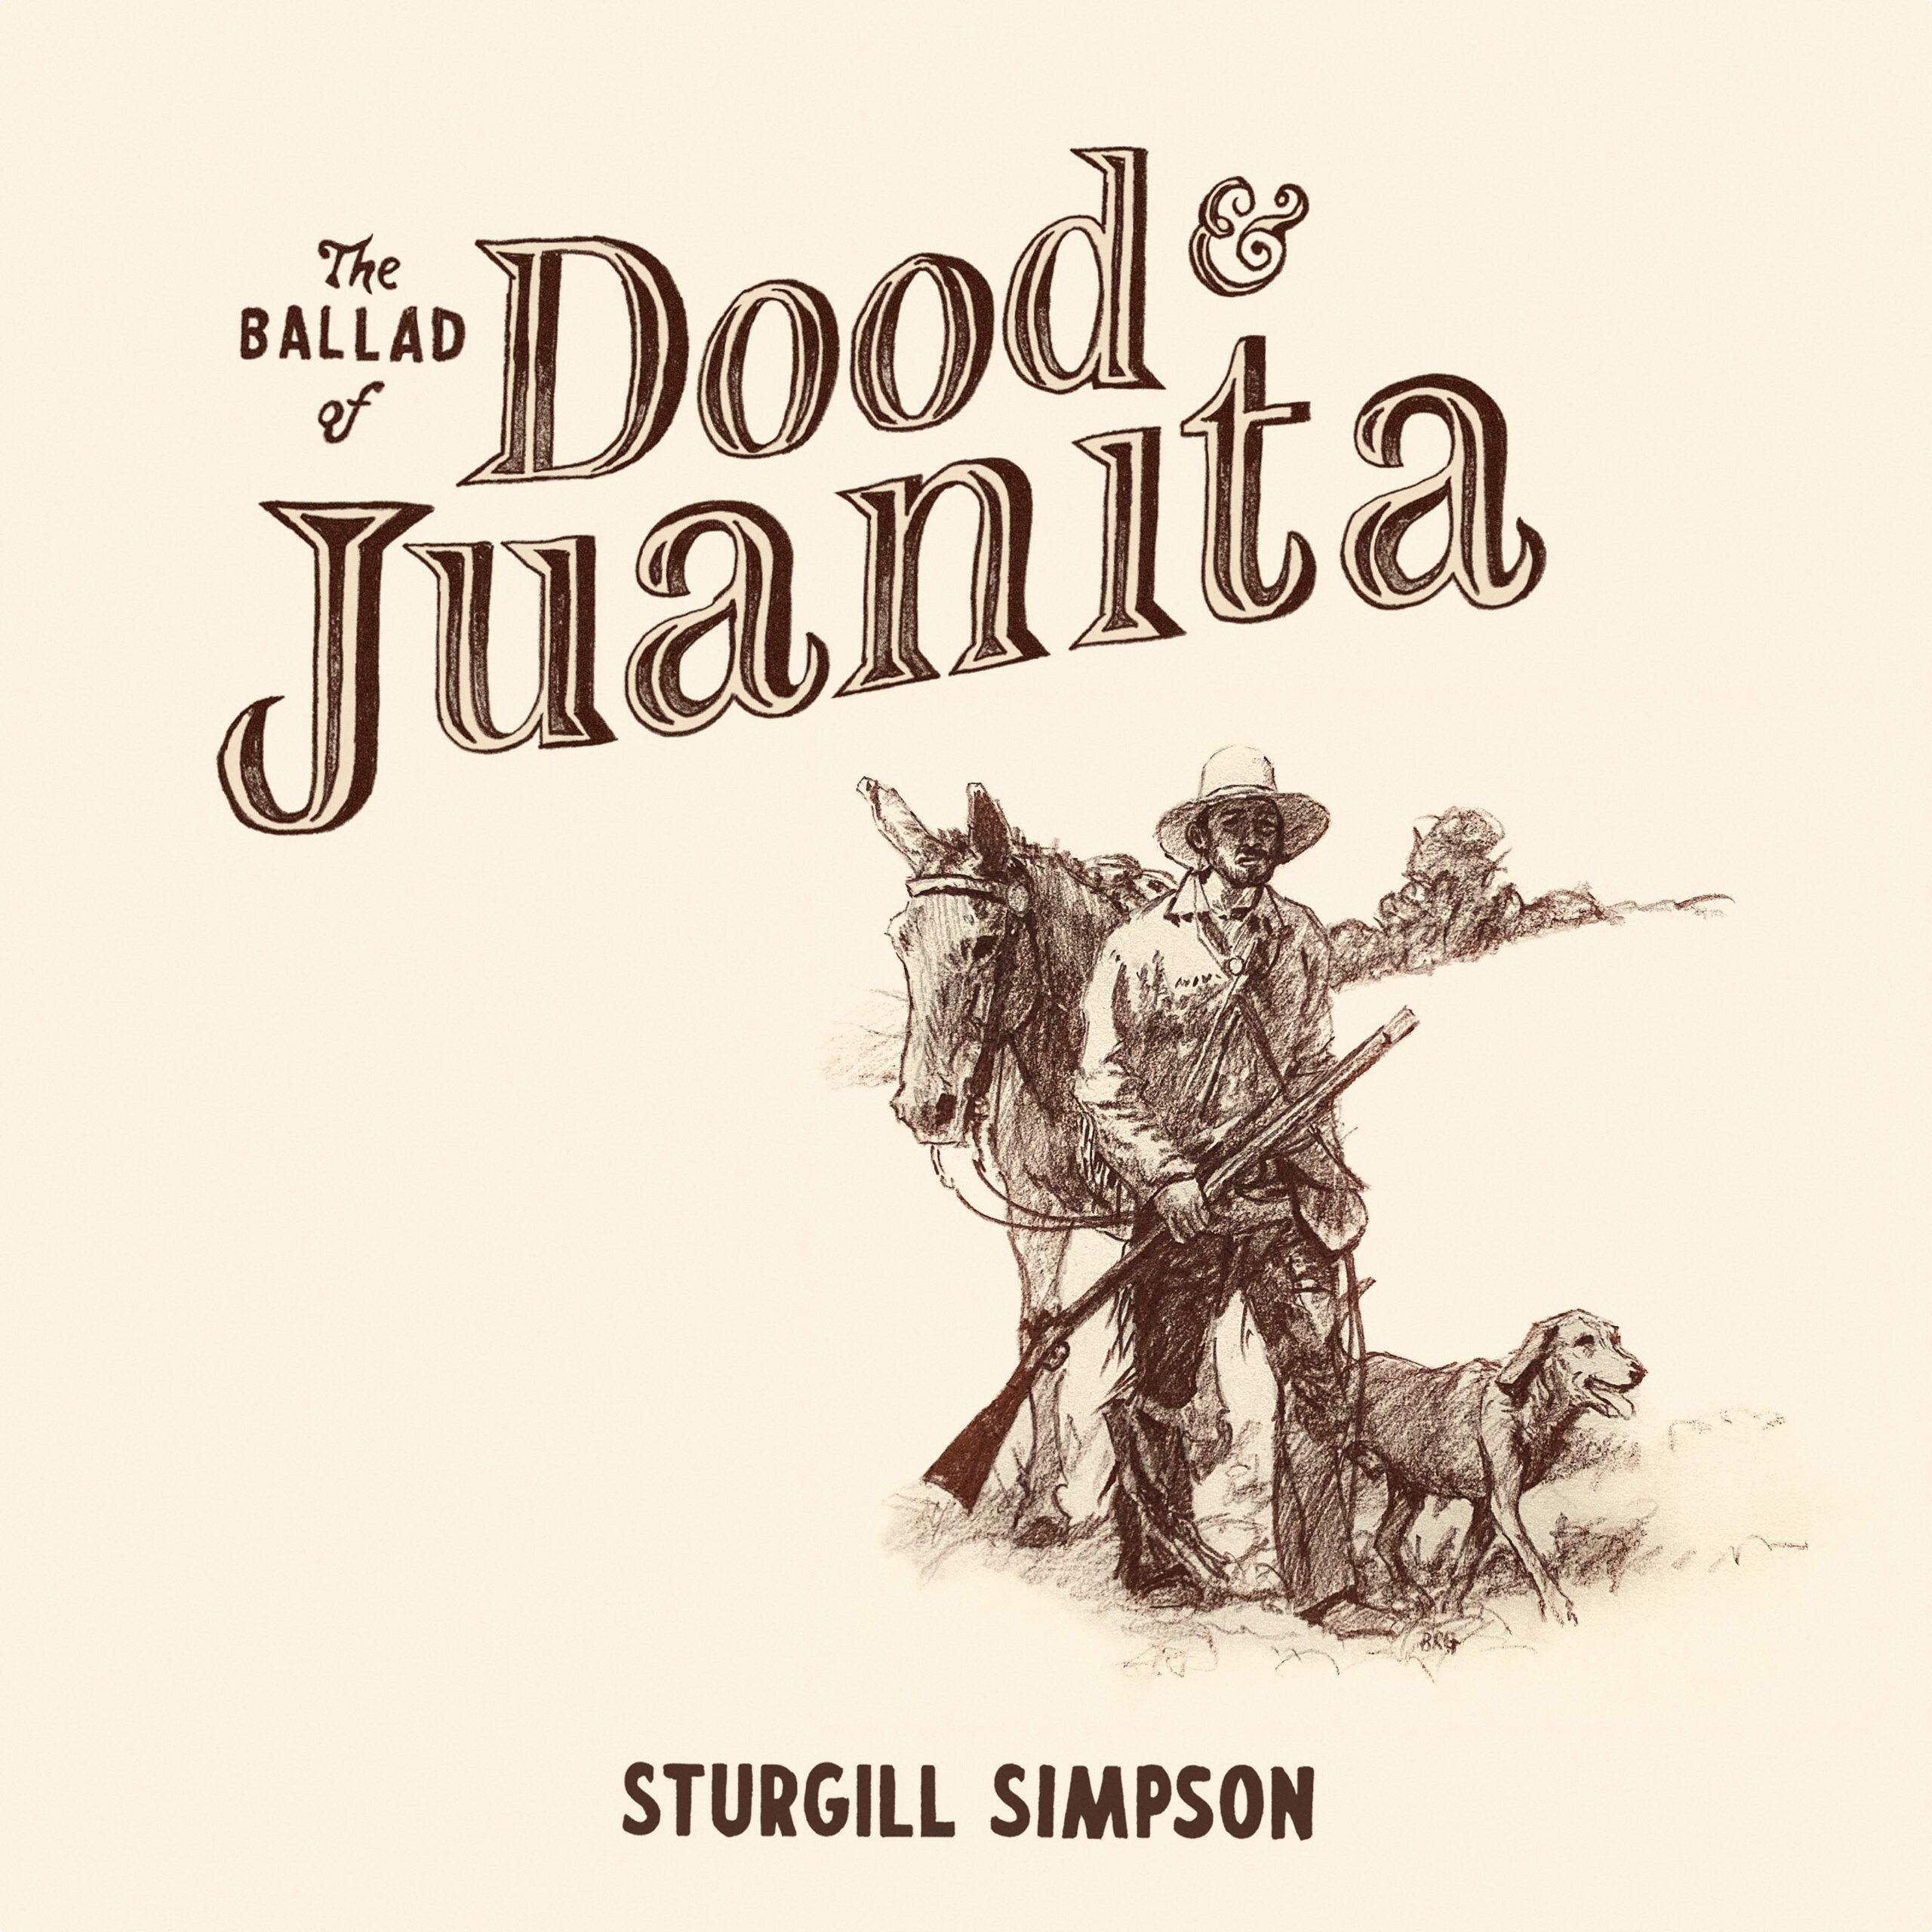 The Ballad of Good & Juanita